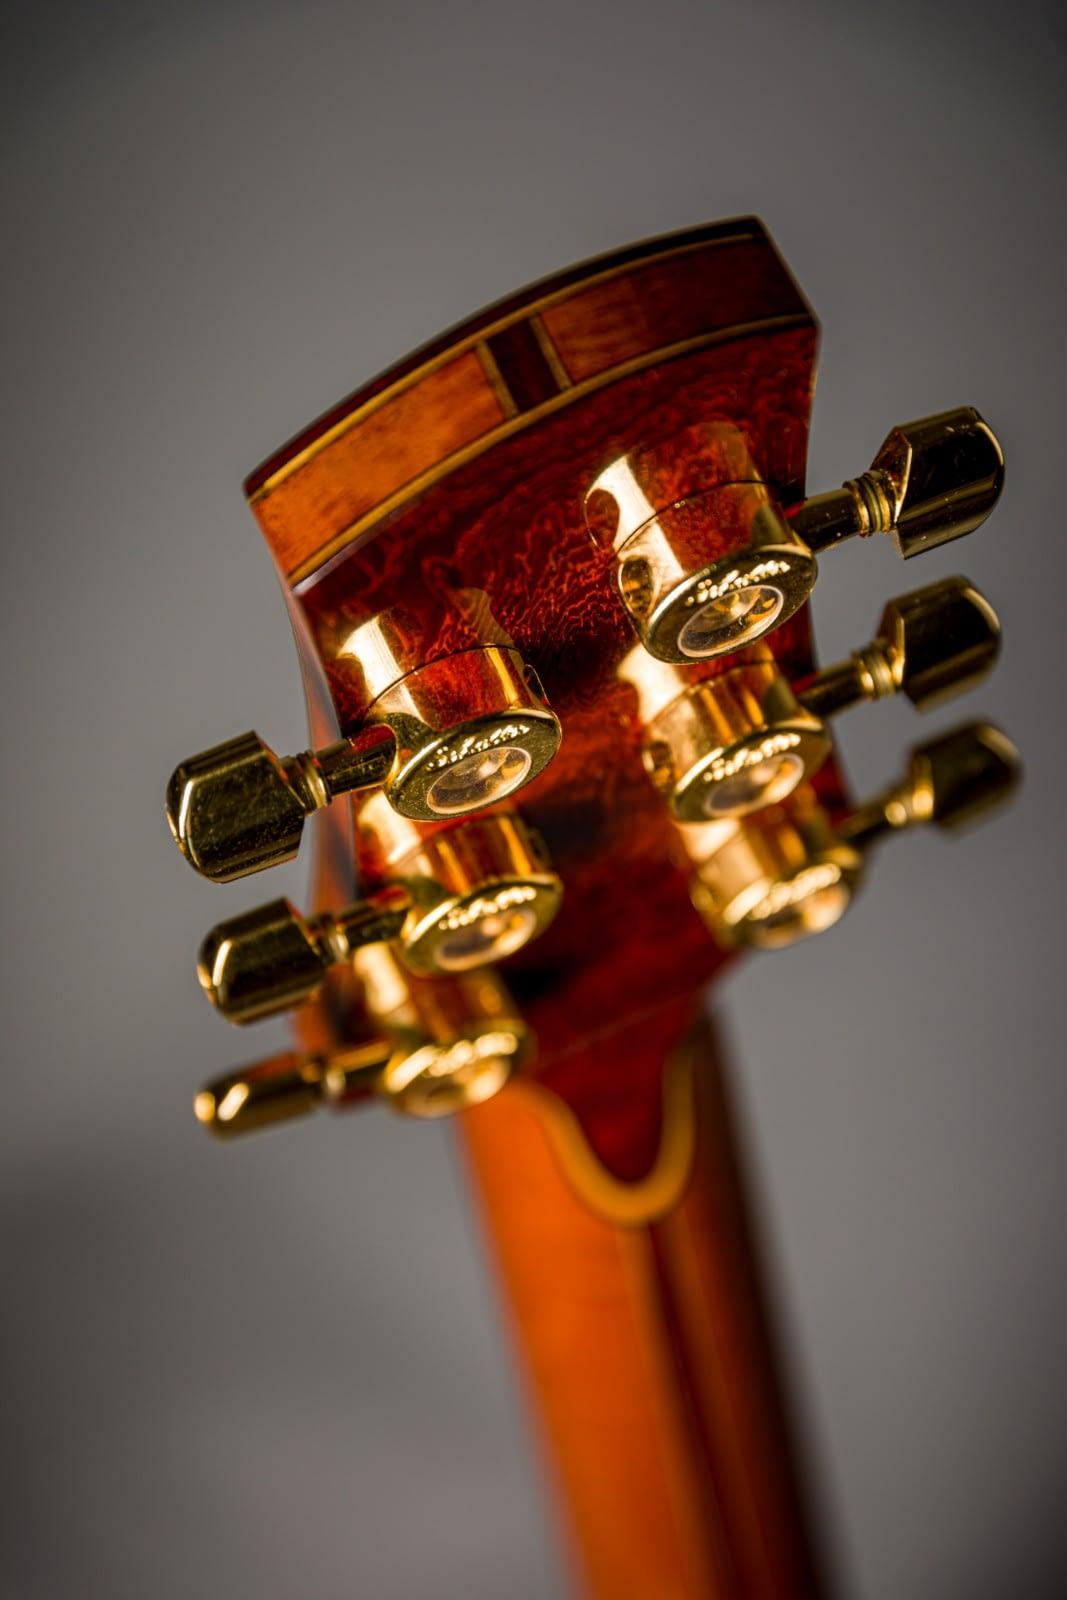 french polished padauk backstrap schaller da vinci machine heads handmade guitar insight